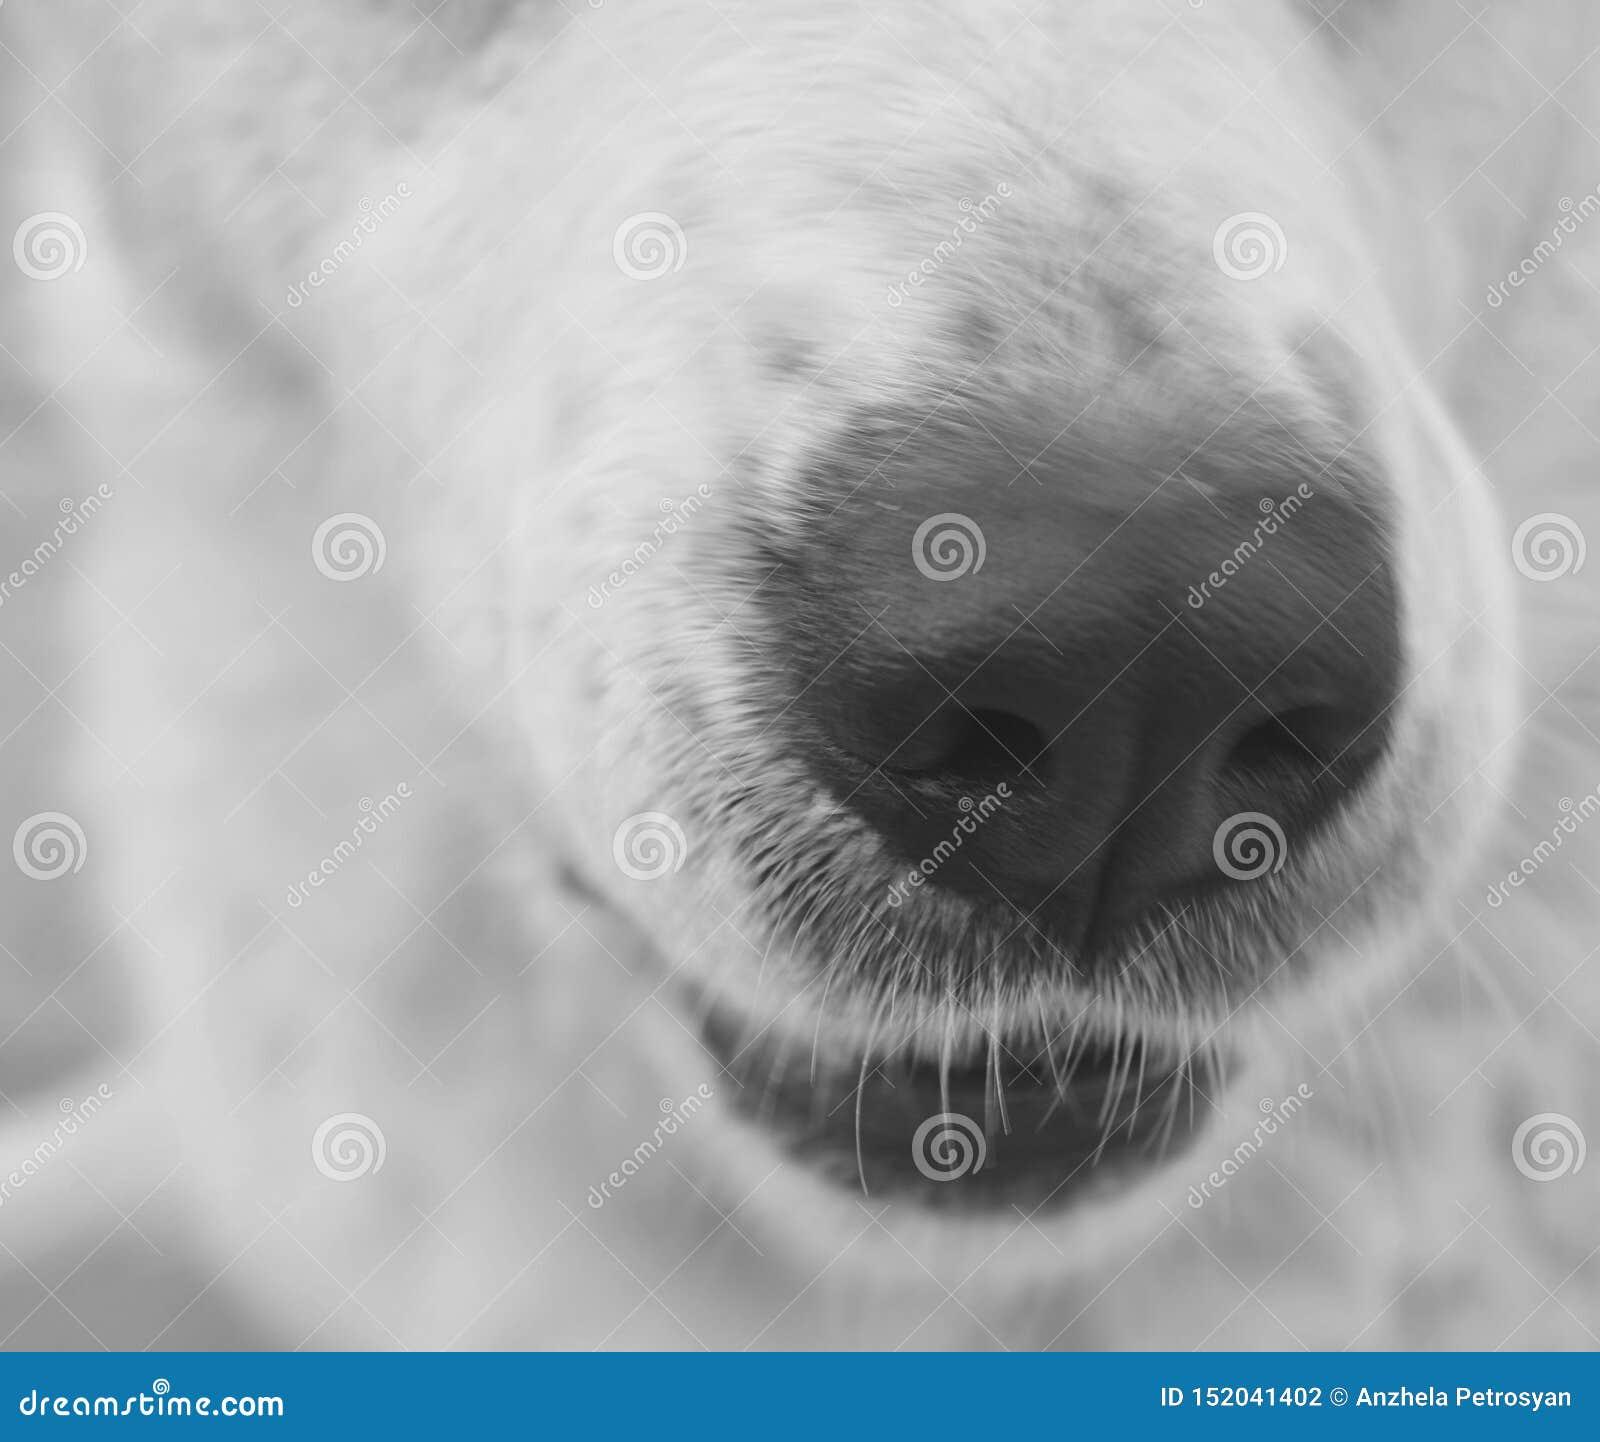 White dog nose